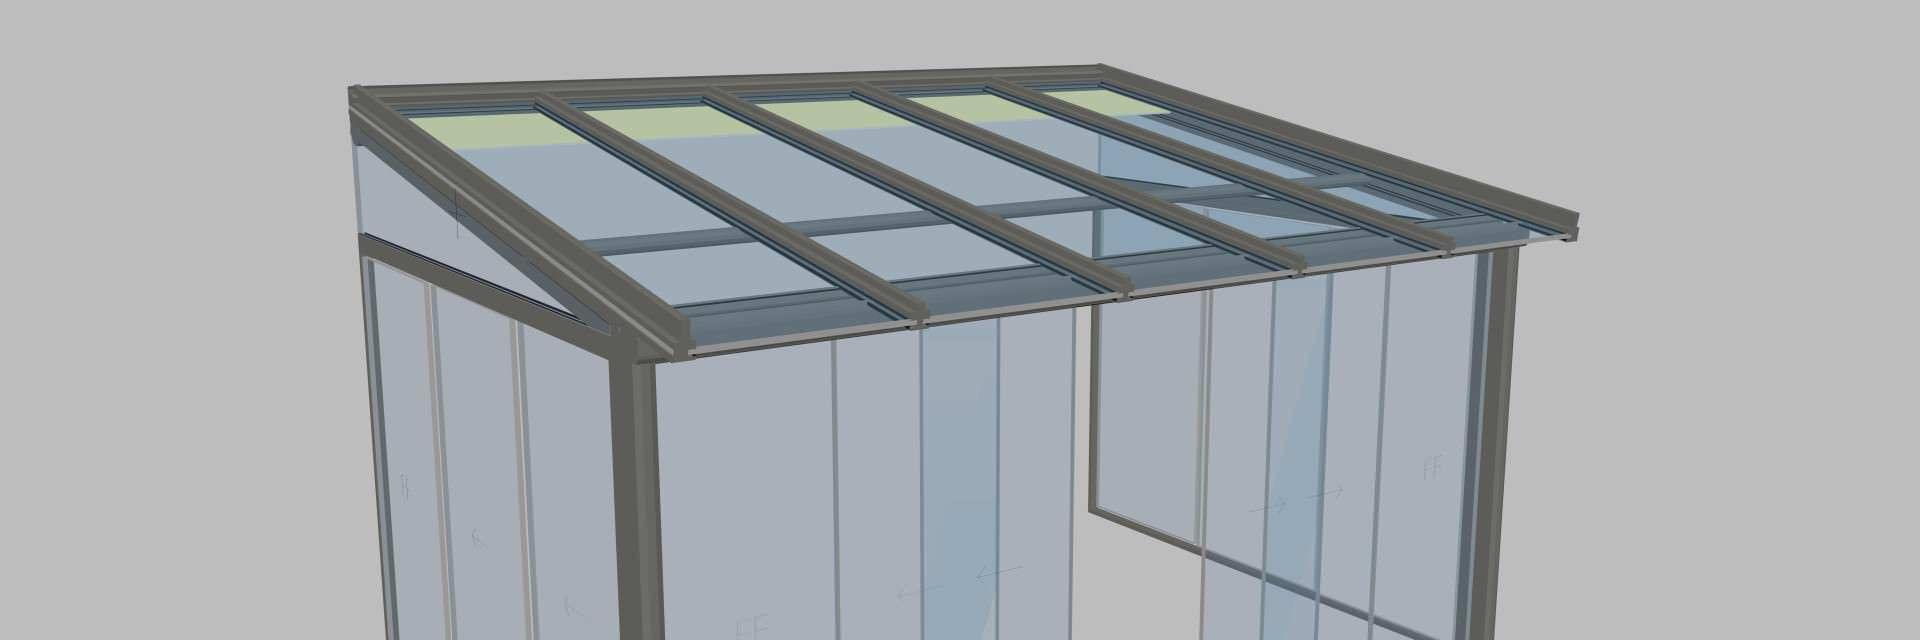 Terrassendach Planungen